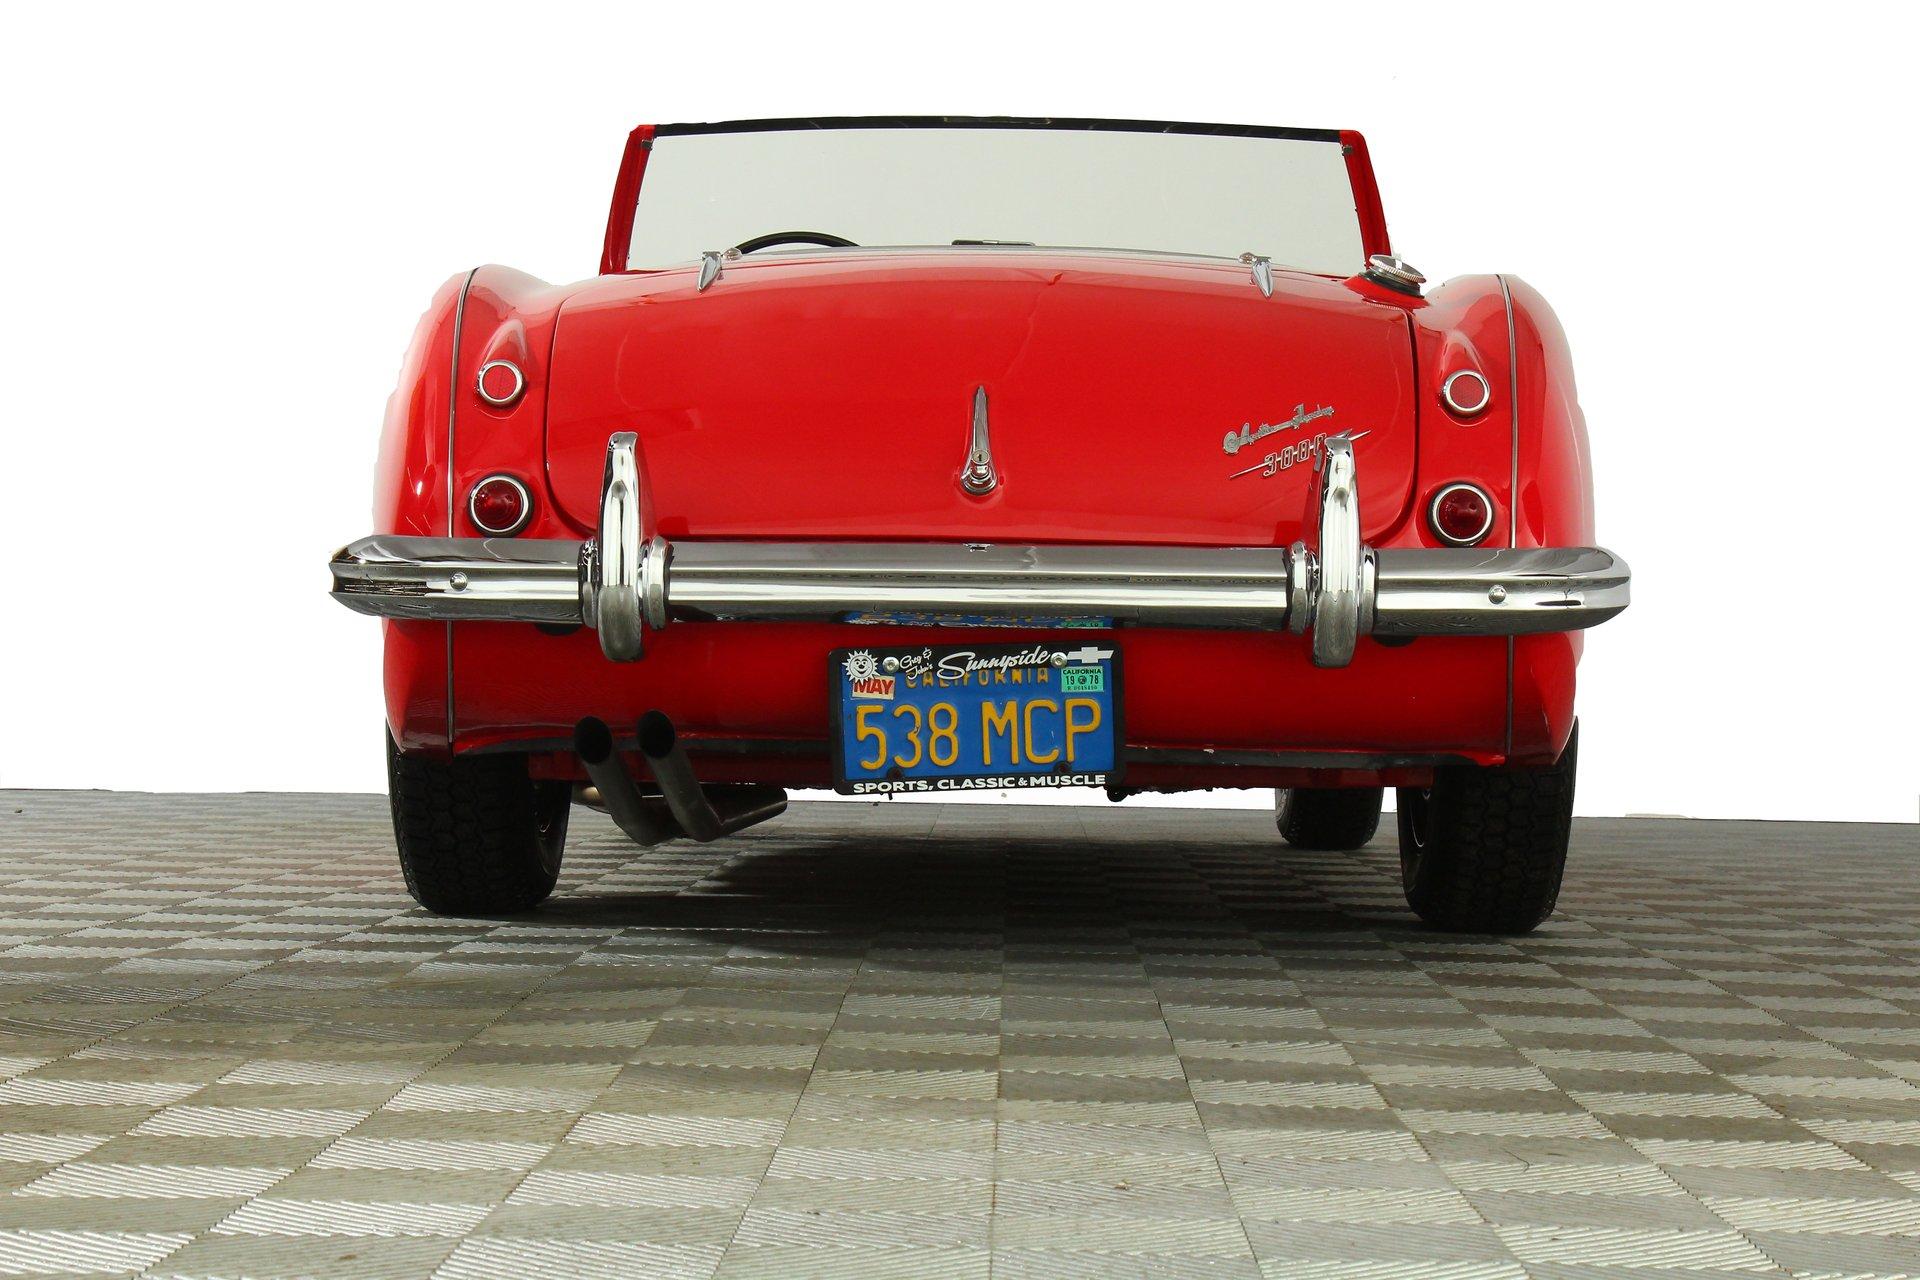 1962 Austin Healey 3000 MarkII